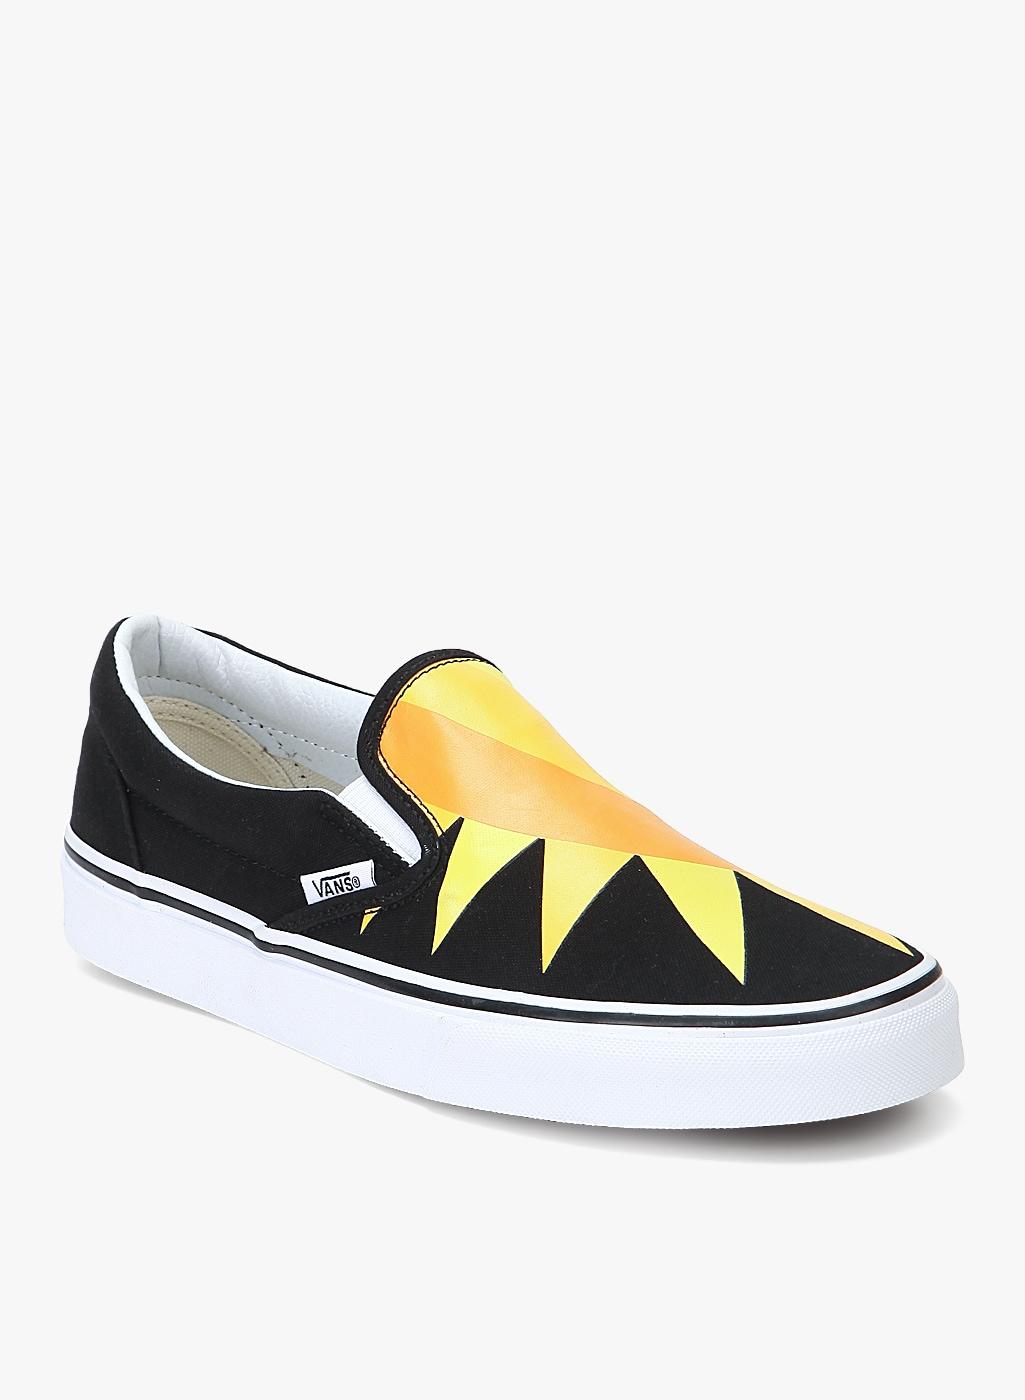 cd46f2e66bc Vans Classic Slip On Black Sneakers for Men online in India at Best ...